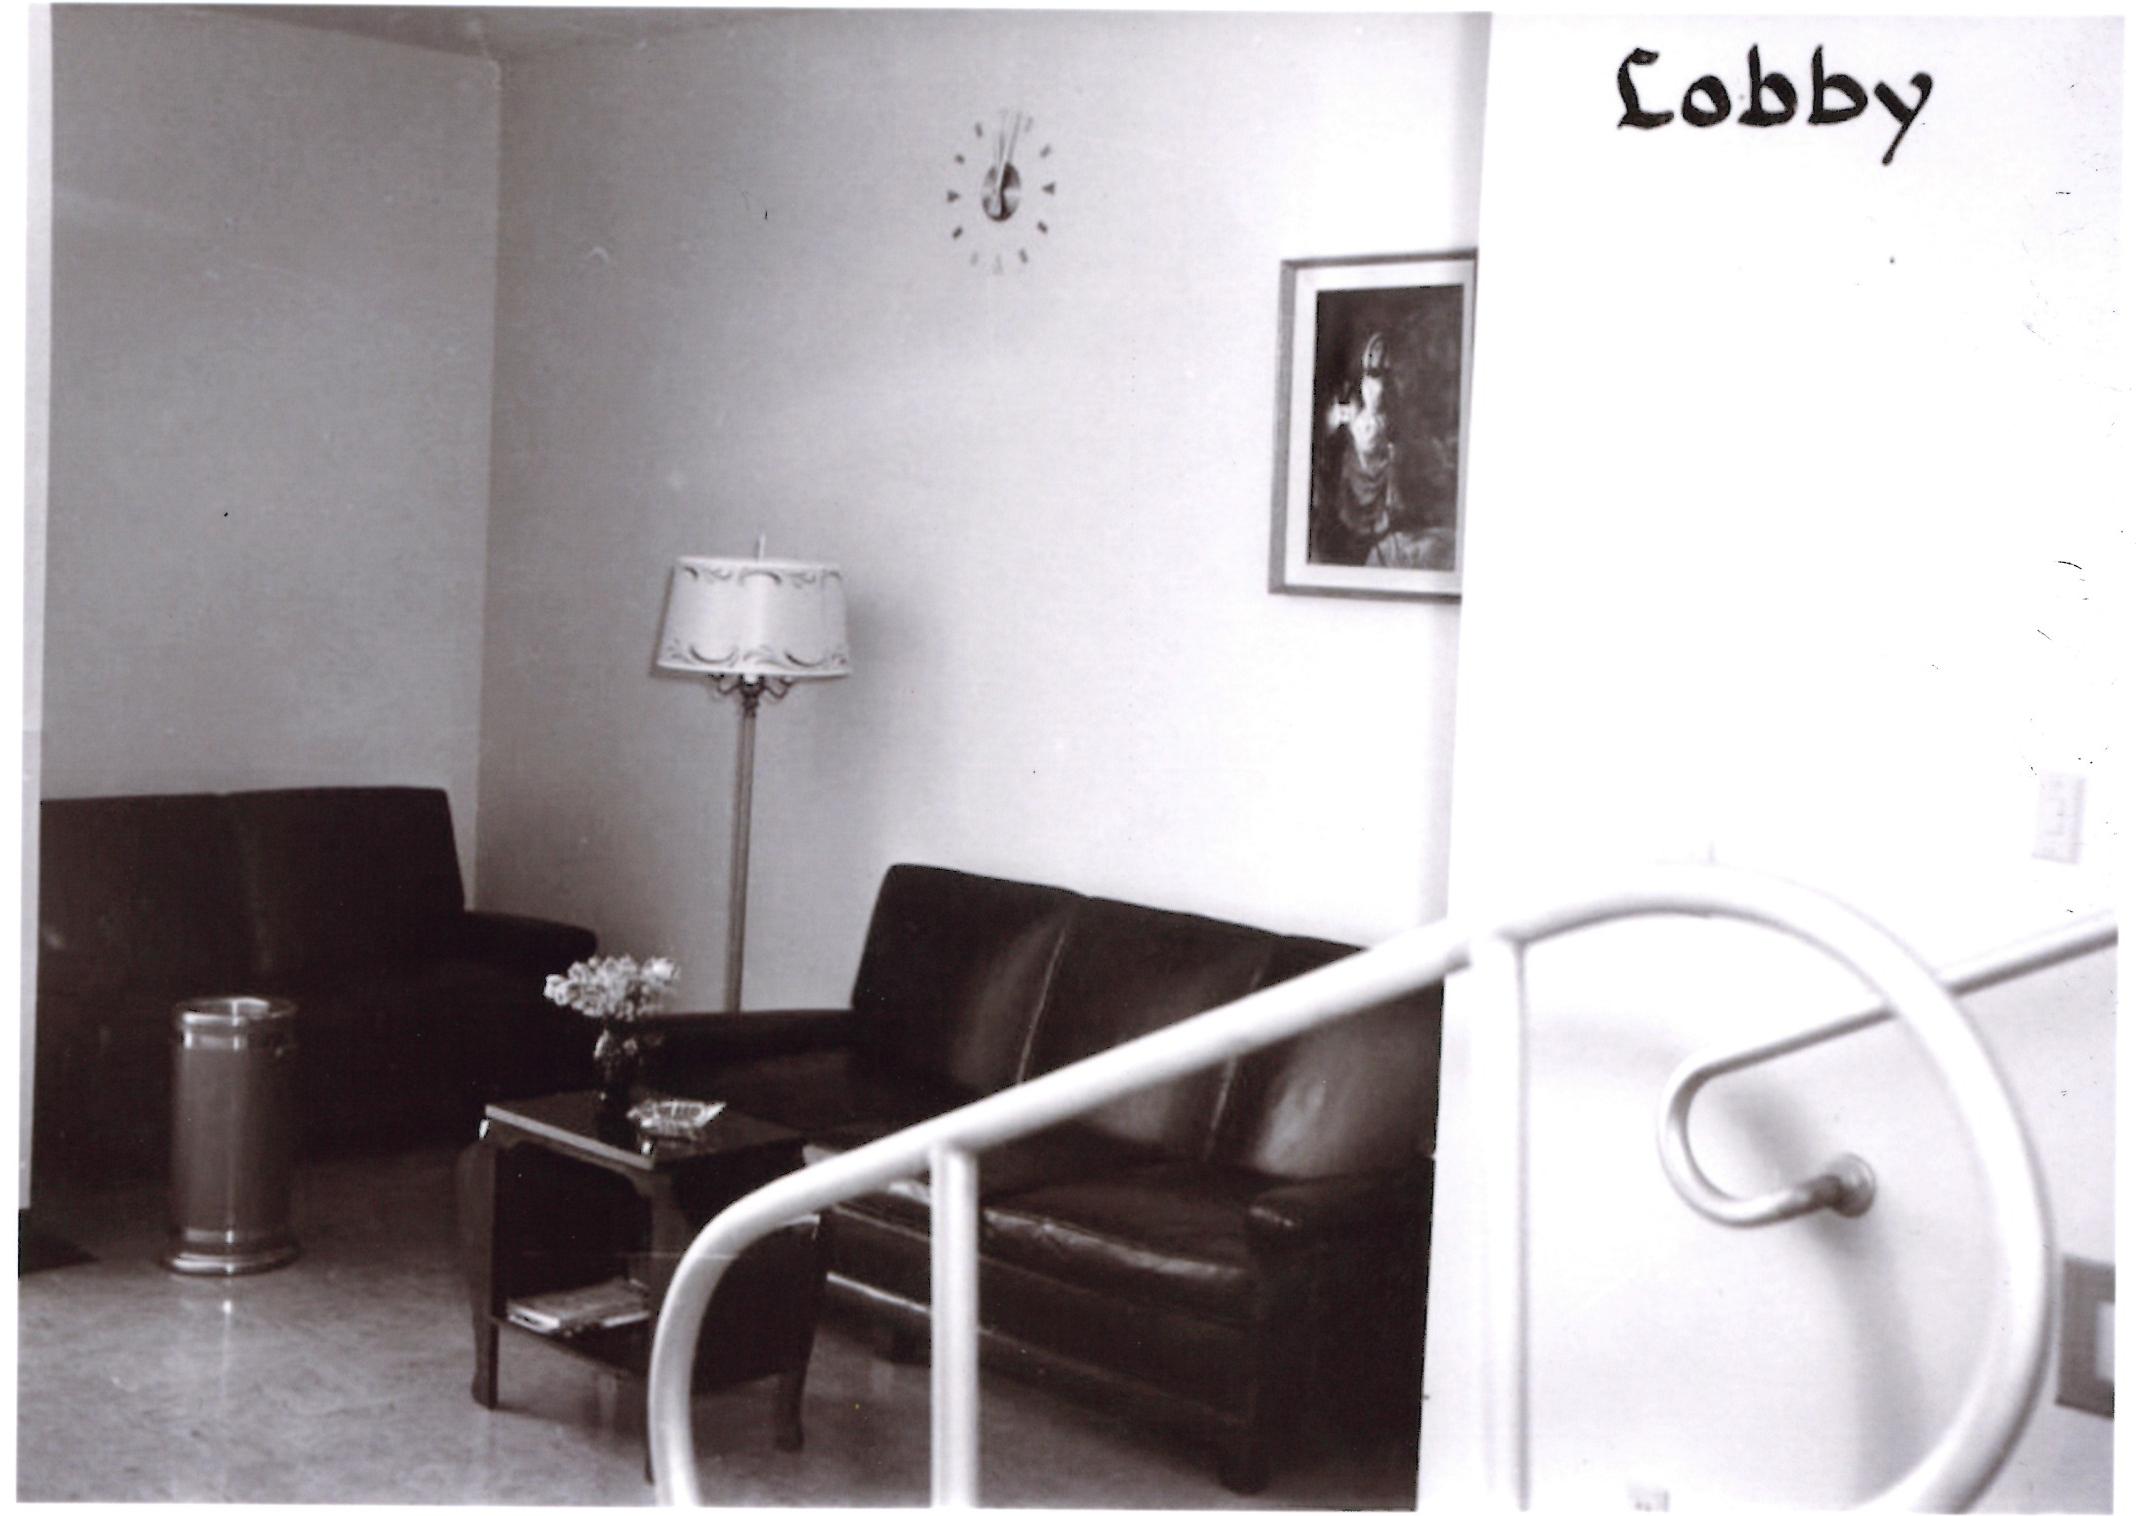 StMartins_lobby2.jpg